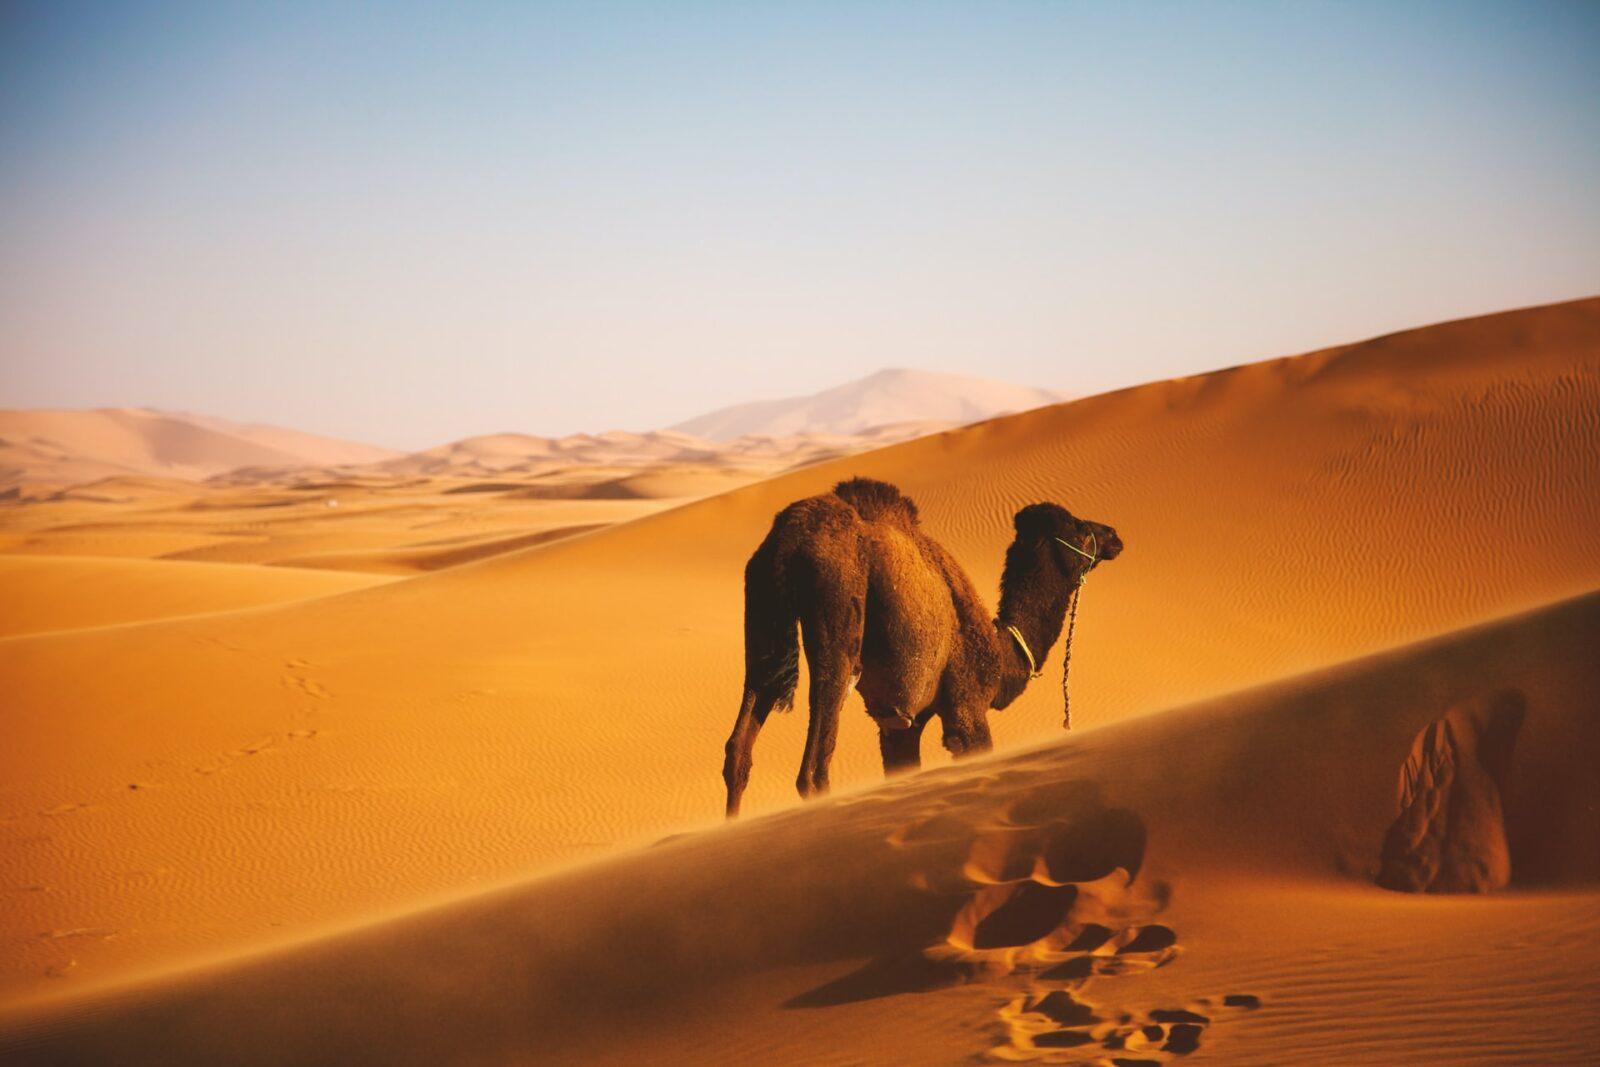 ben ostrower i Z1o10BPPk unsplash 1536x1024 - Guide Morocco Tours